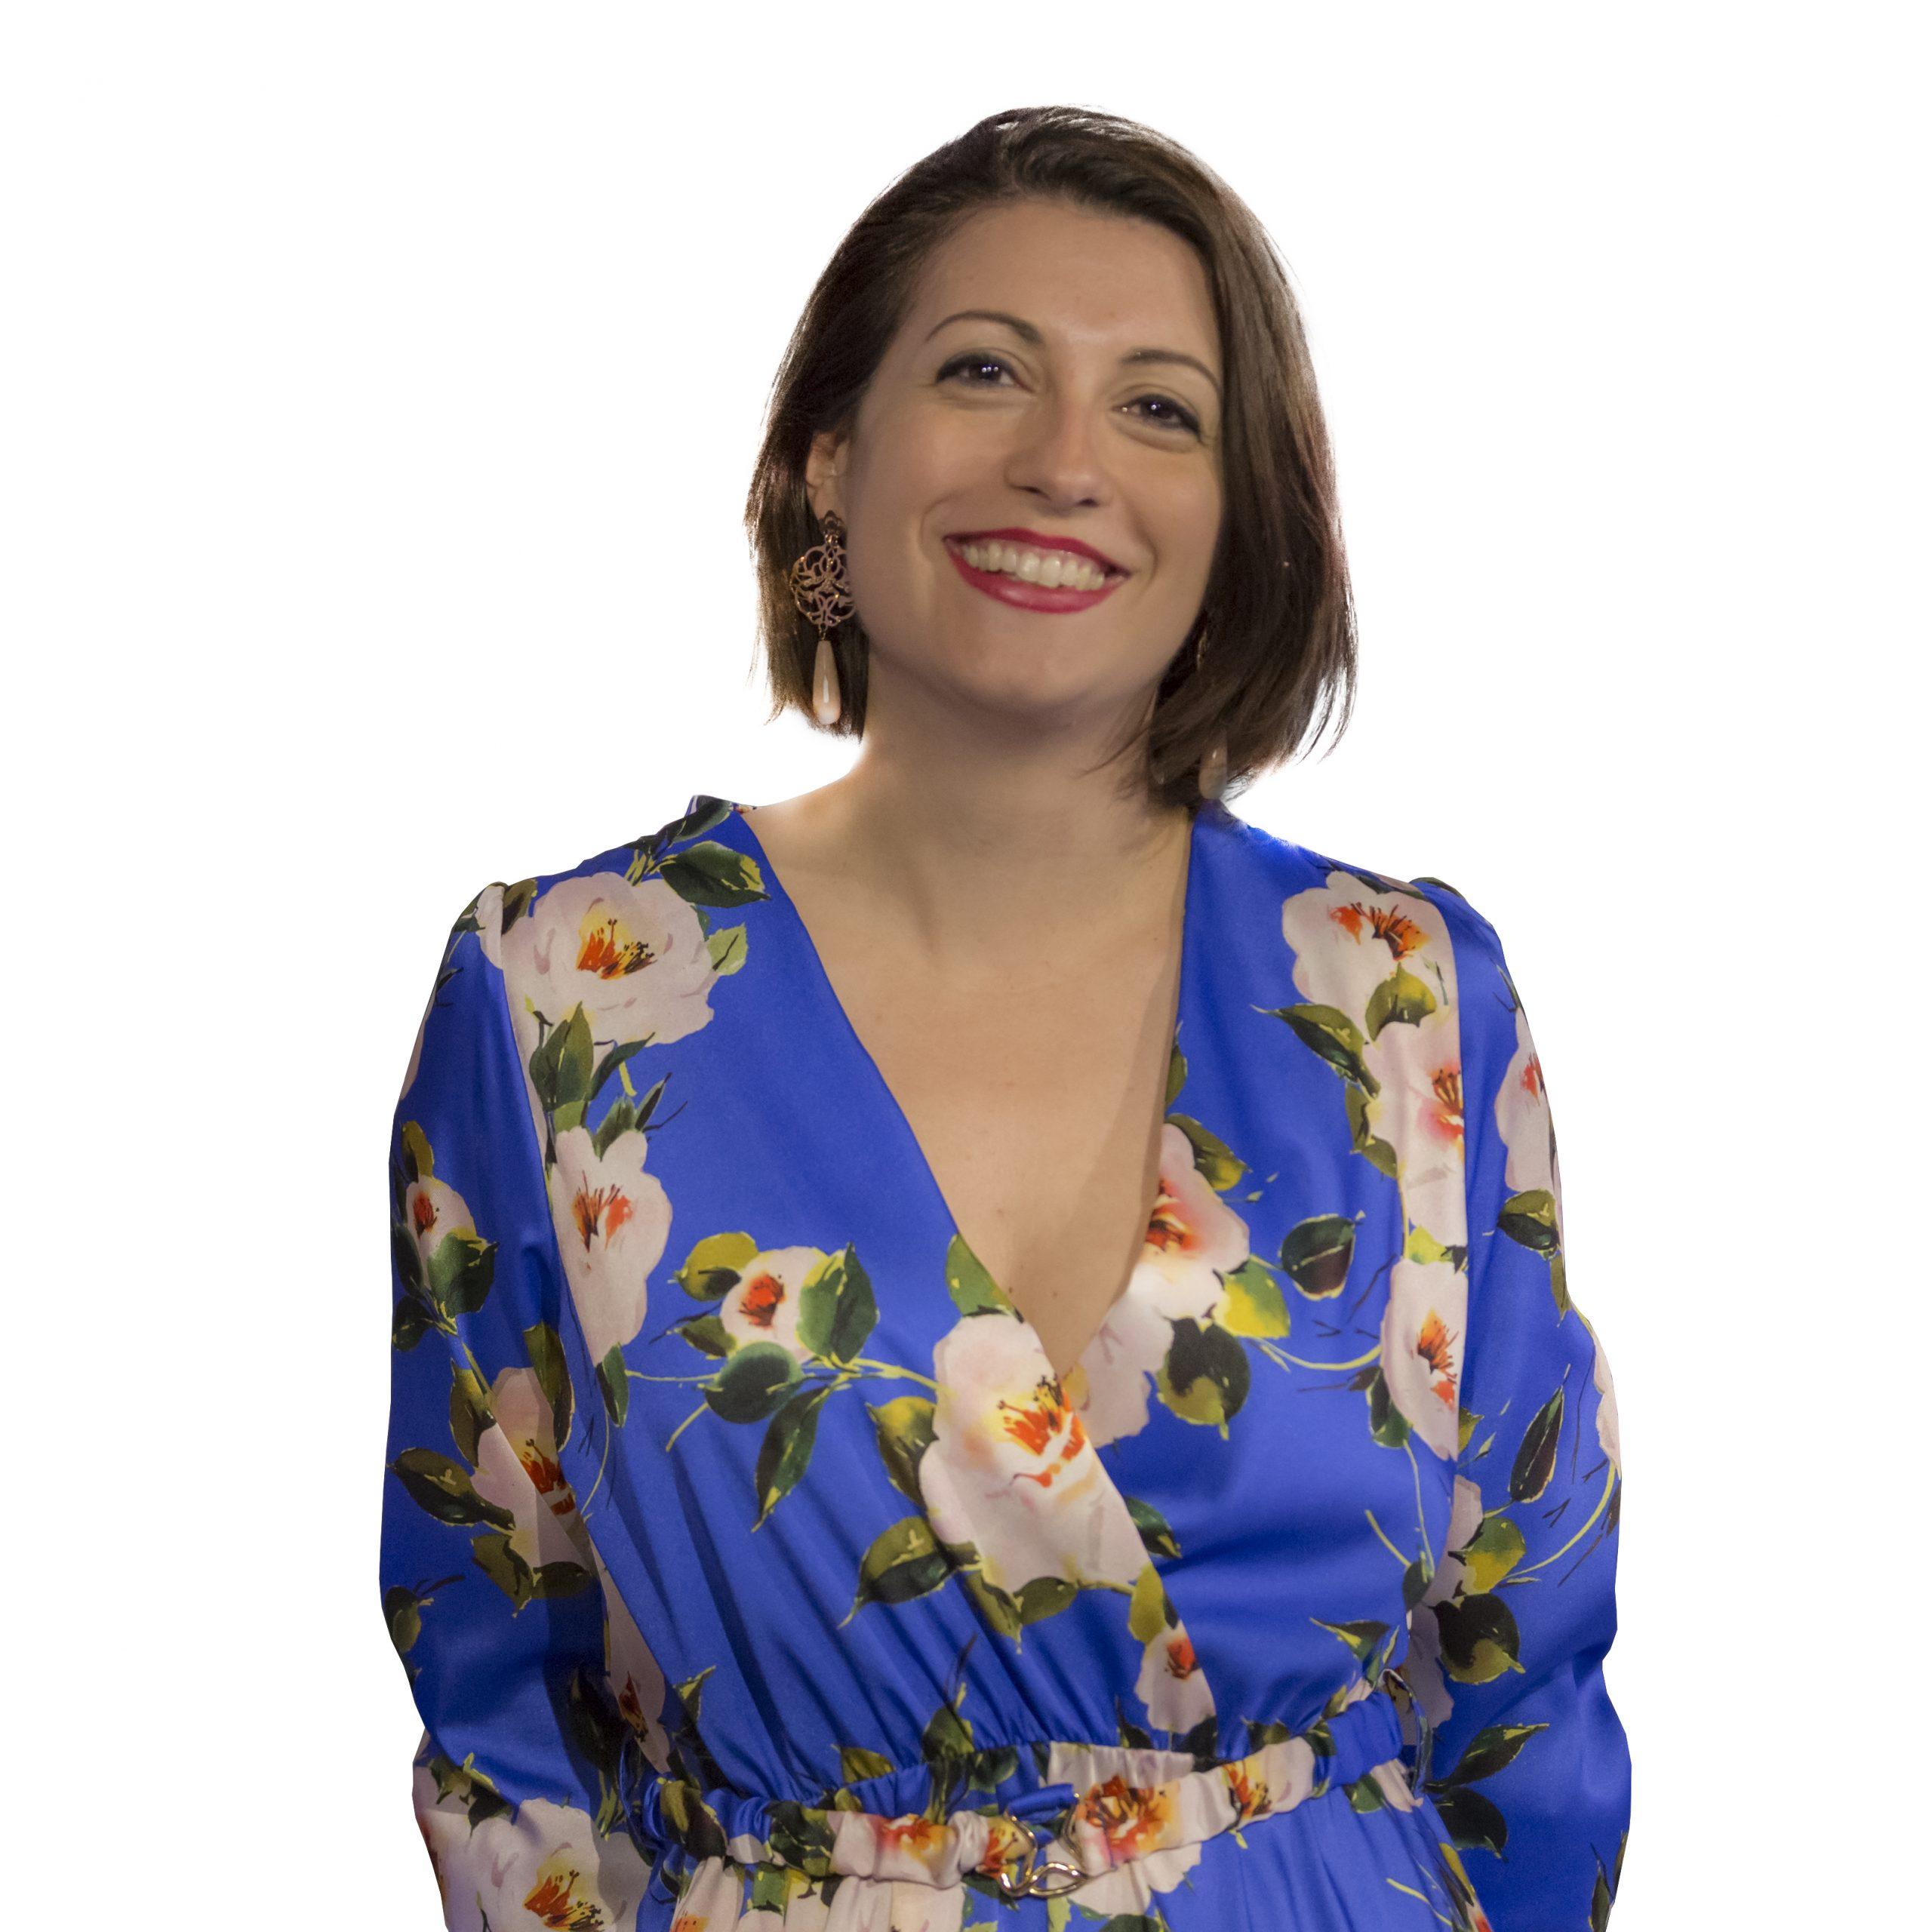 Sara Malaguti